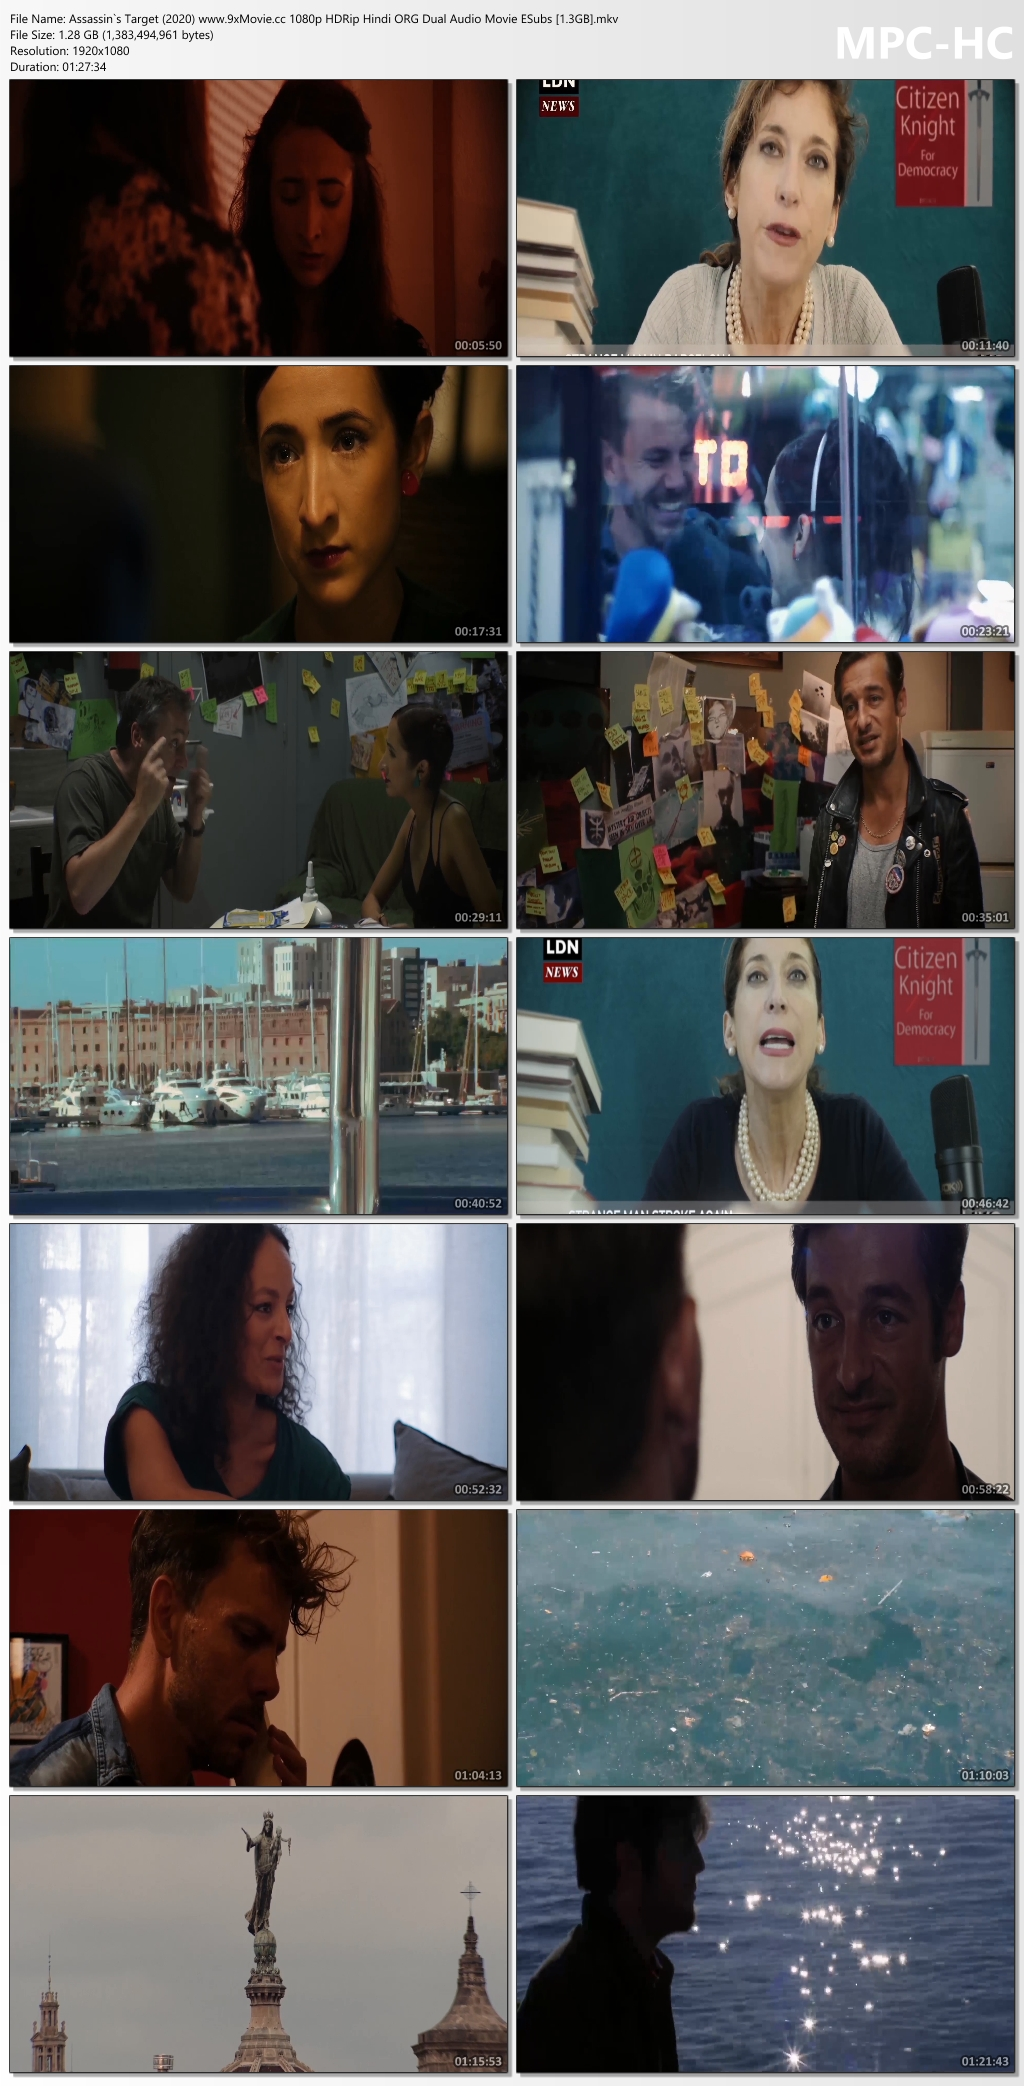 Assassin-s-Target-2020-www-9x-Movie-cc-1080p-HDRip-Hindi-ORG-Dual-Audio-Movie-ESubs-1-3-GB-mkv